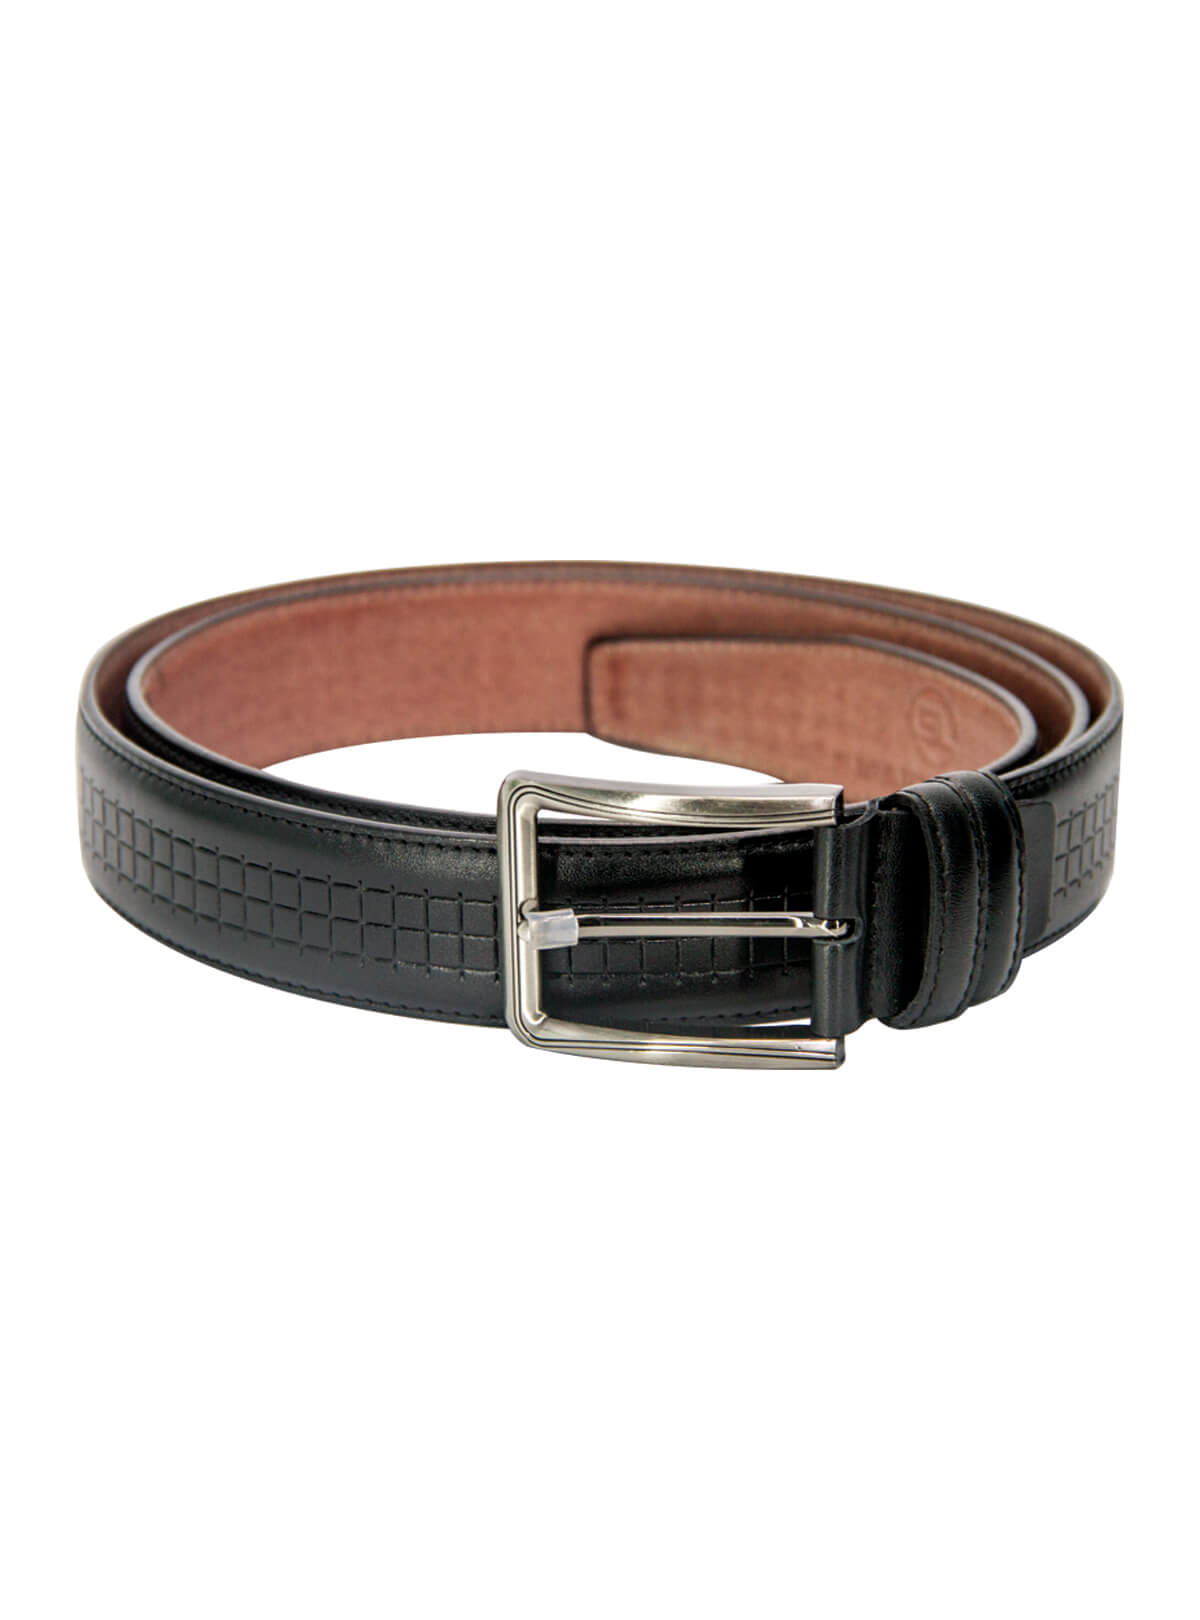 Woodsmoke Grey Leather Formal Belt For Men